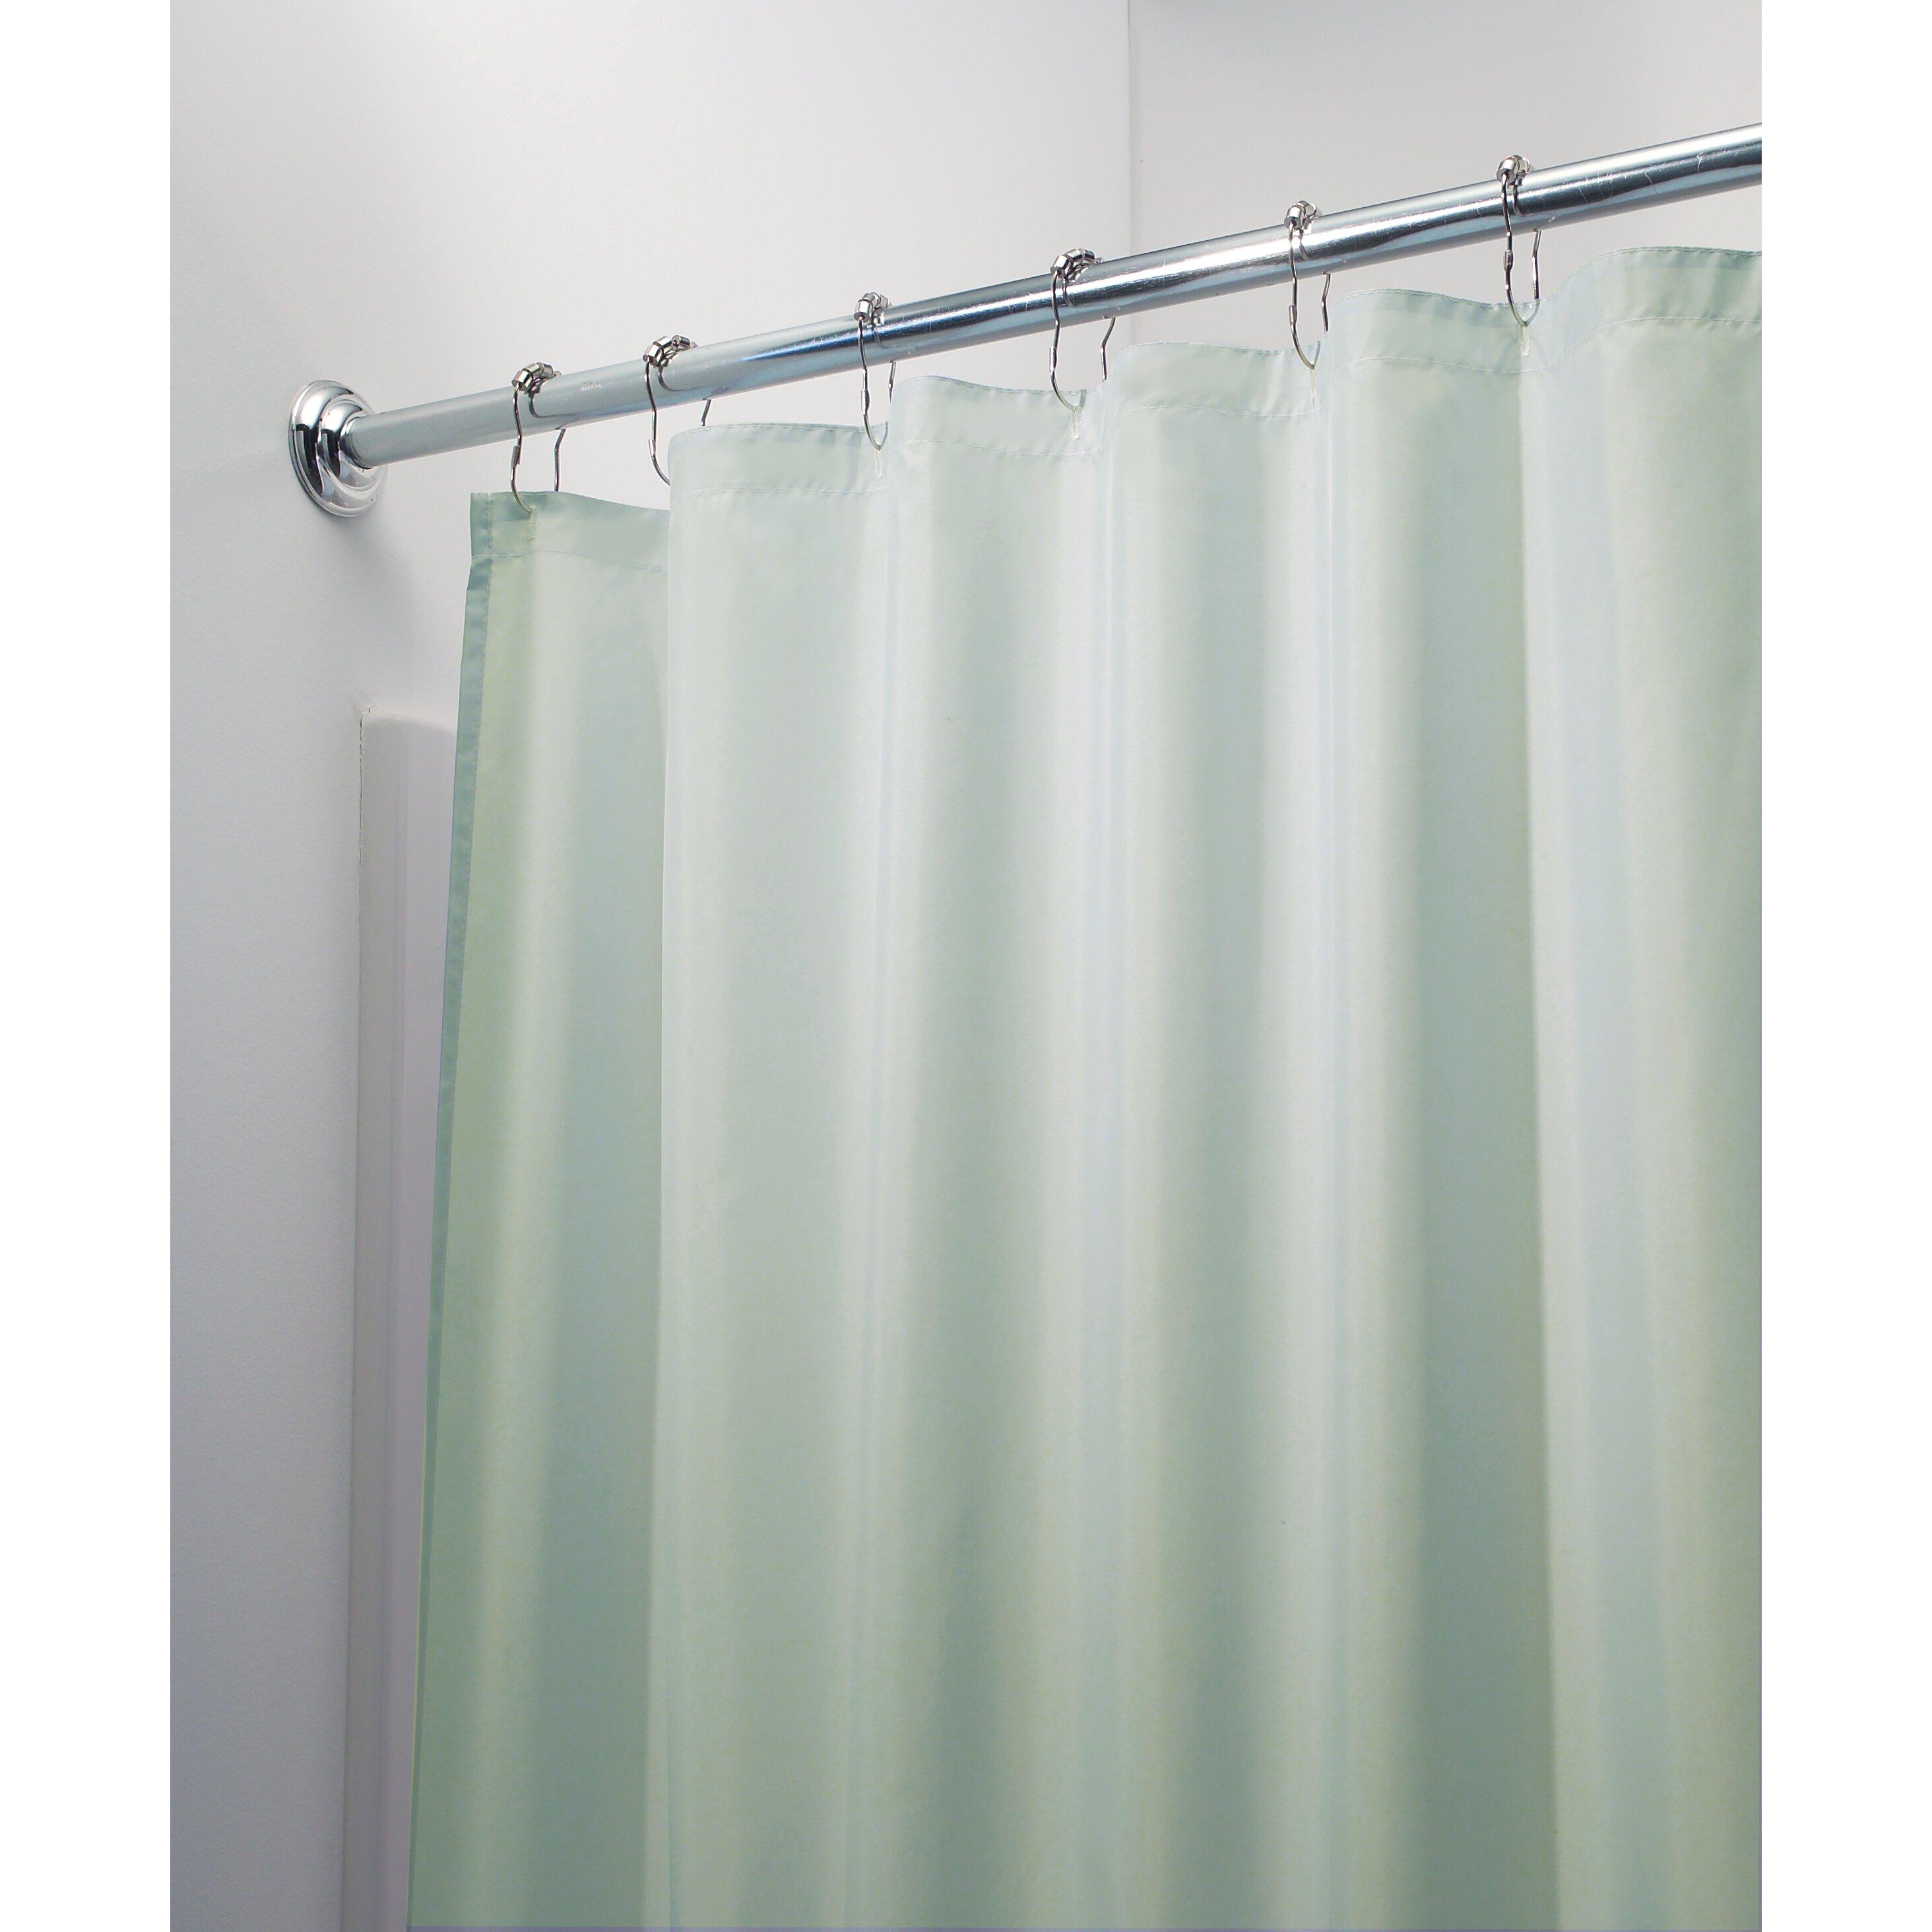 Symple Stuff Waterproof Shower Curtain Liner & Reviews